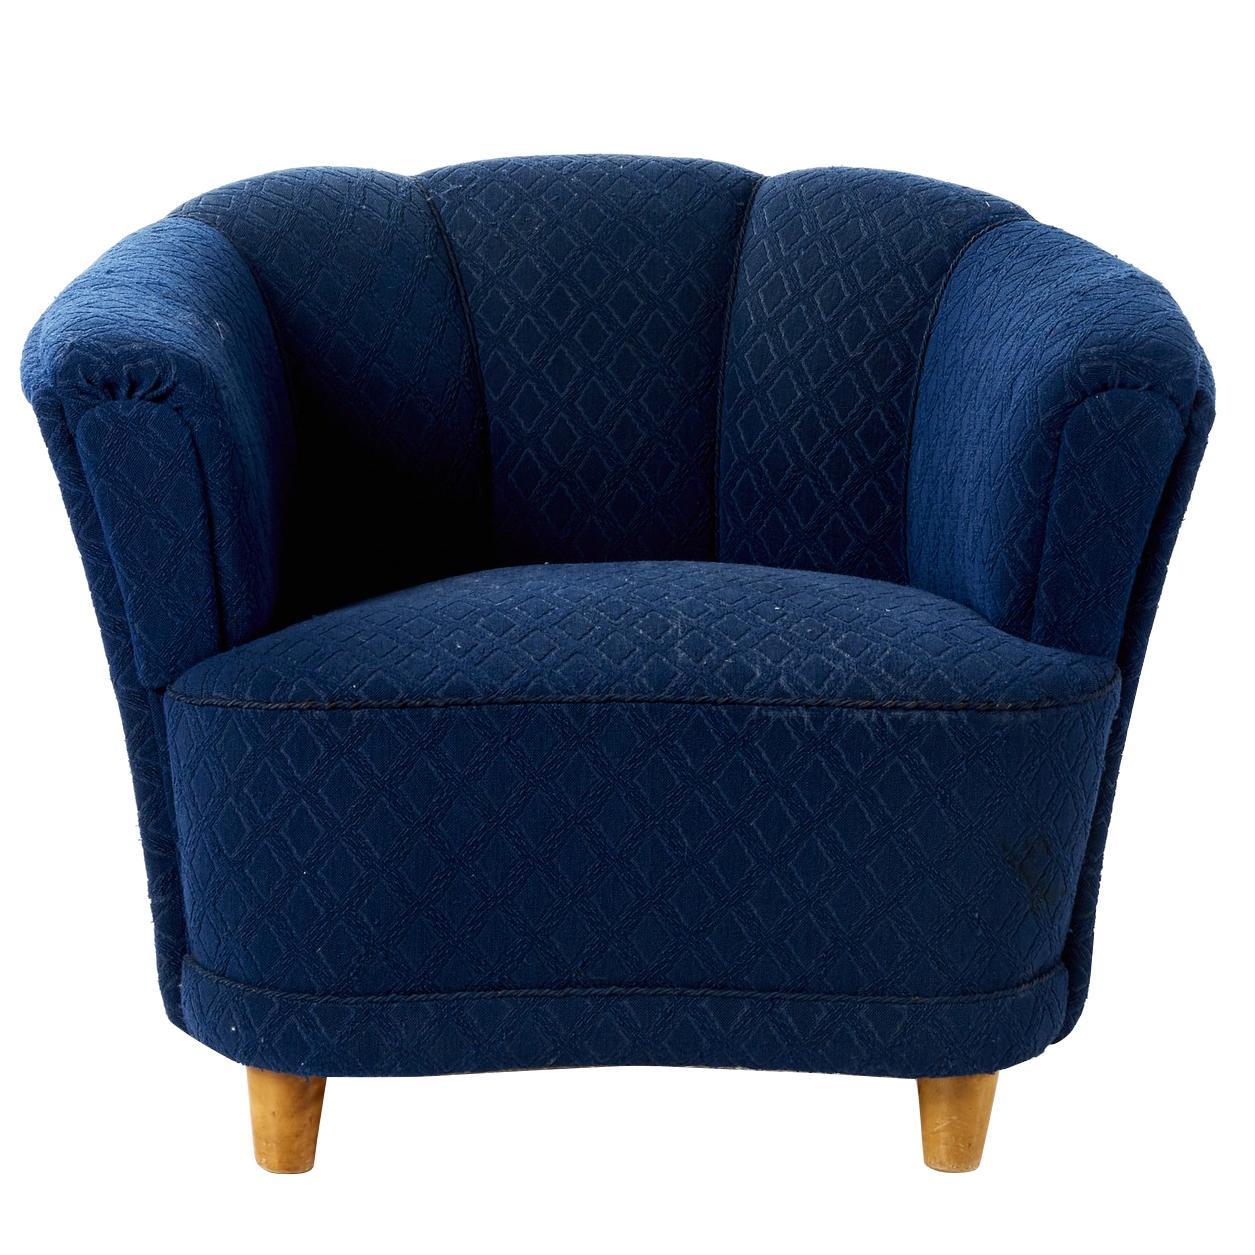 Otto Schulz 1940s Lounge Chair for Boet, Scandinavian Midcentury